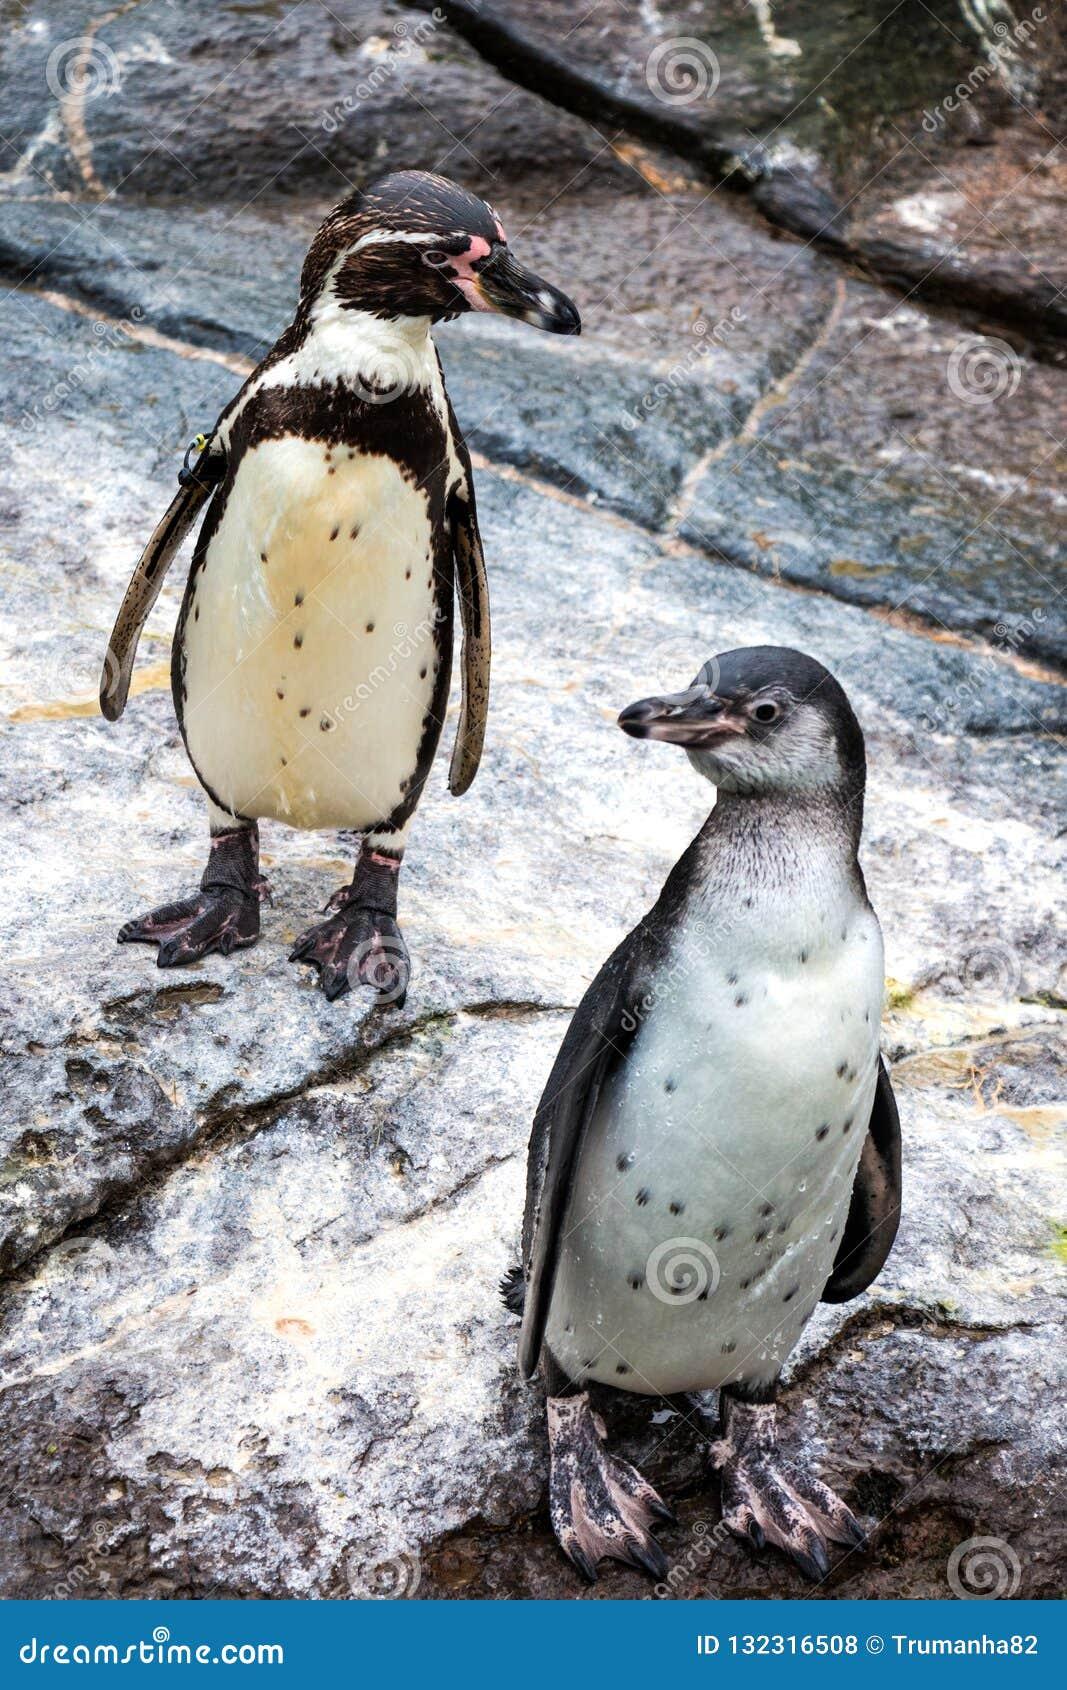 Cute Humboldt Penguins at Atlantic Sea Park in Alesund